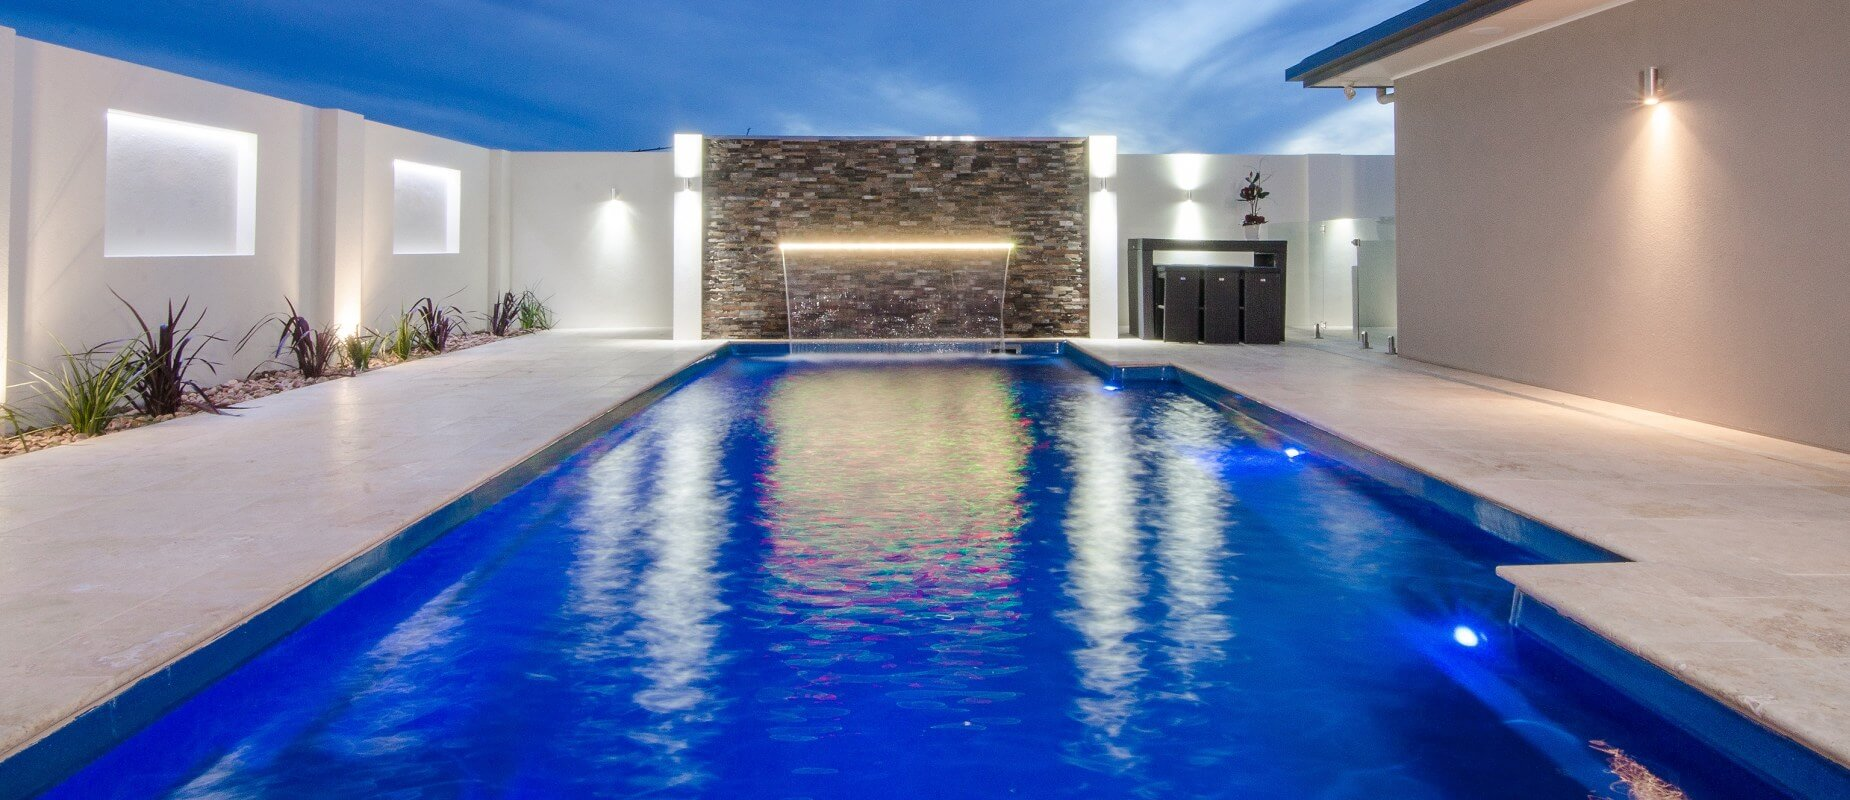 piscina de lux modele frumoase 2